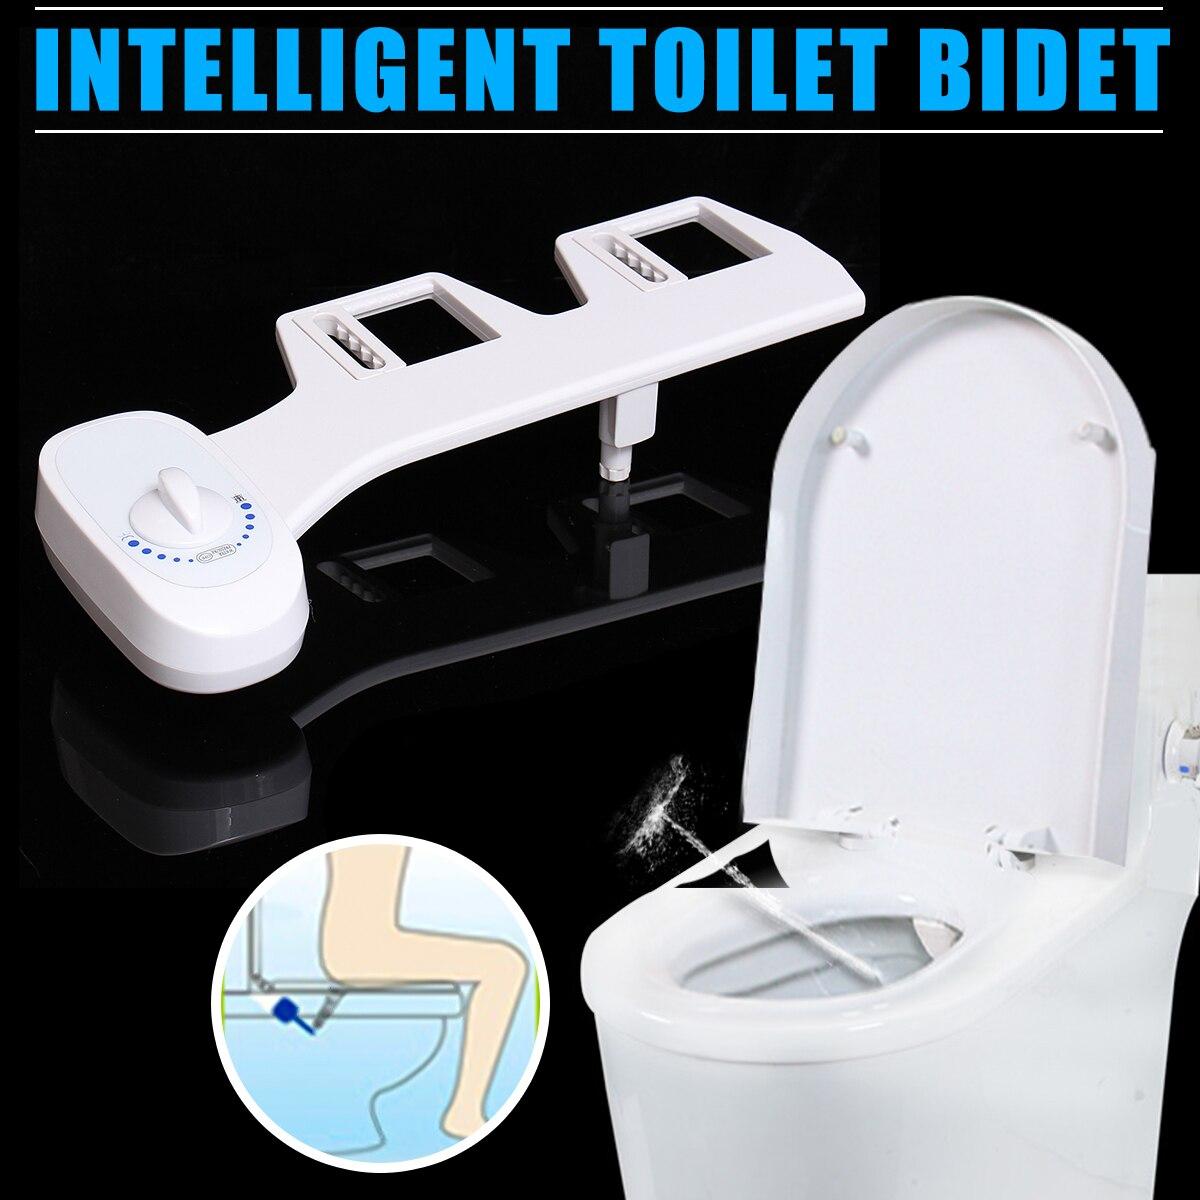 Image 3 - Xueqin Single Nozzle Bathroom Toilet Seat Bidet Sprayer Cold Water Non Electric Toilet Sprayer Nozzle Sprinkle  1/2  15/16Bidets   -